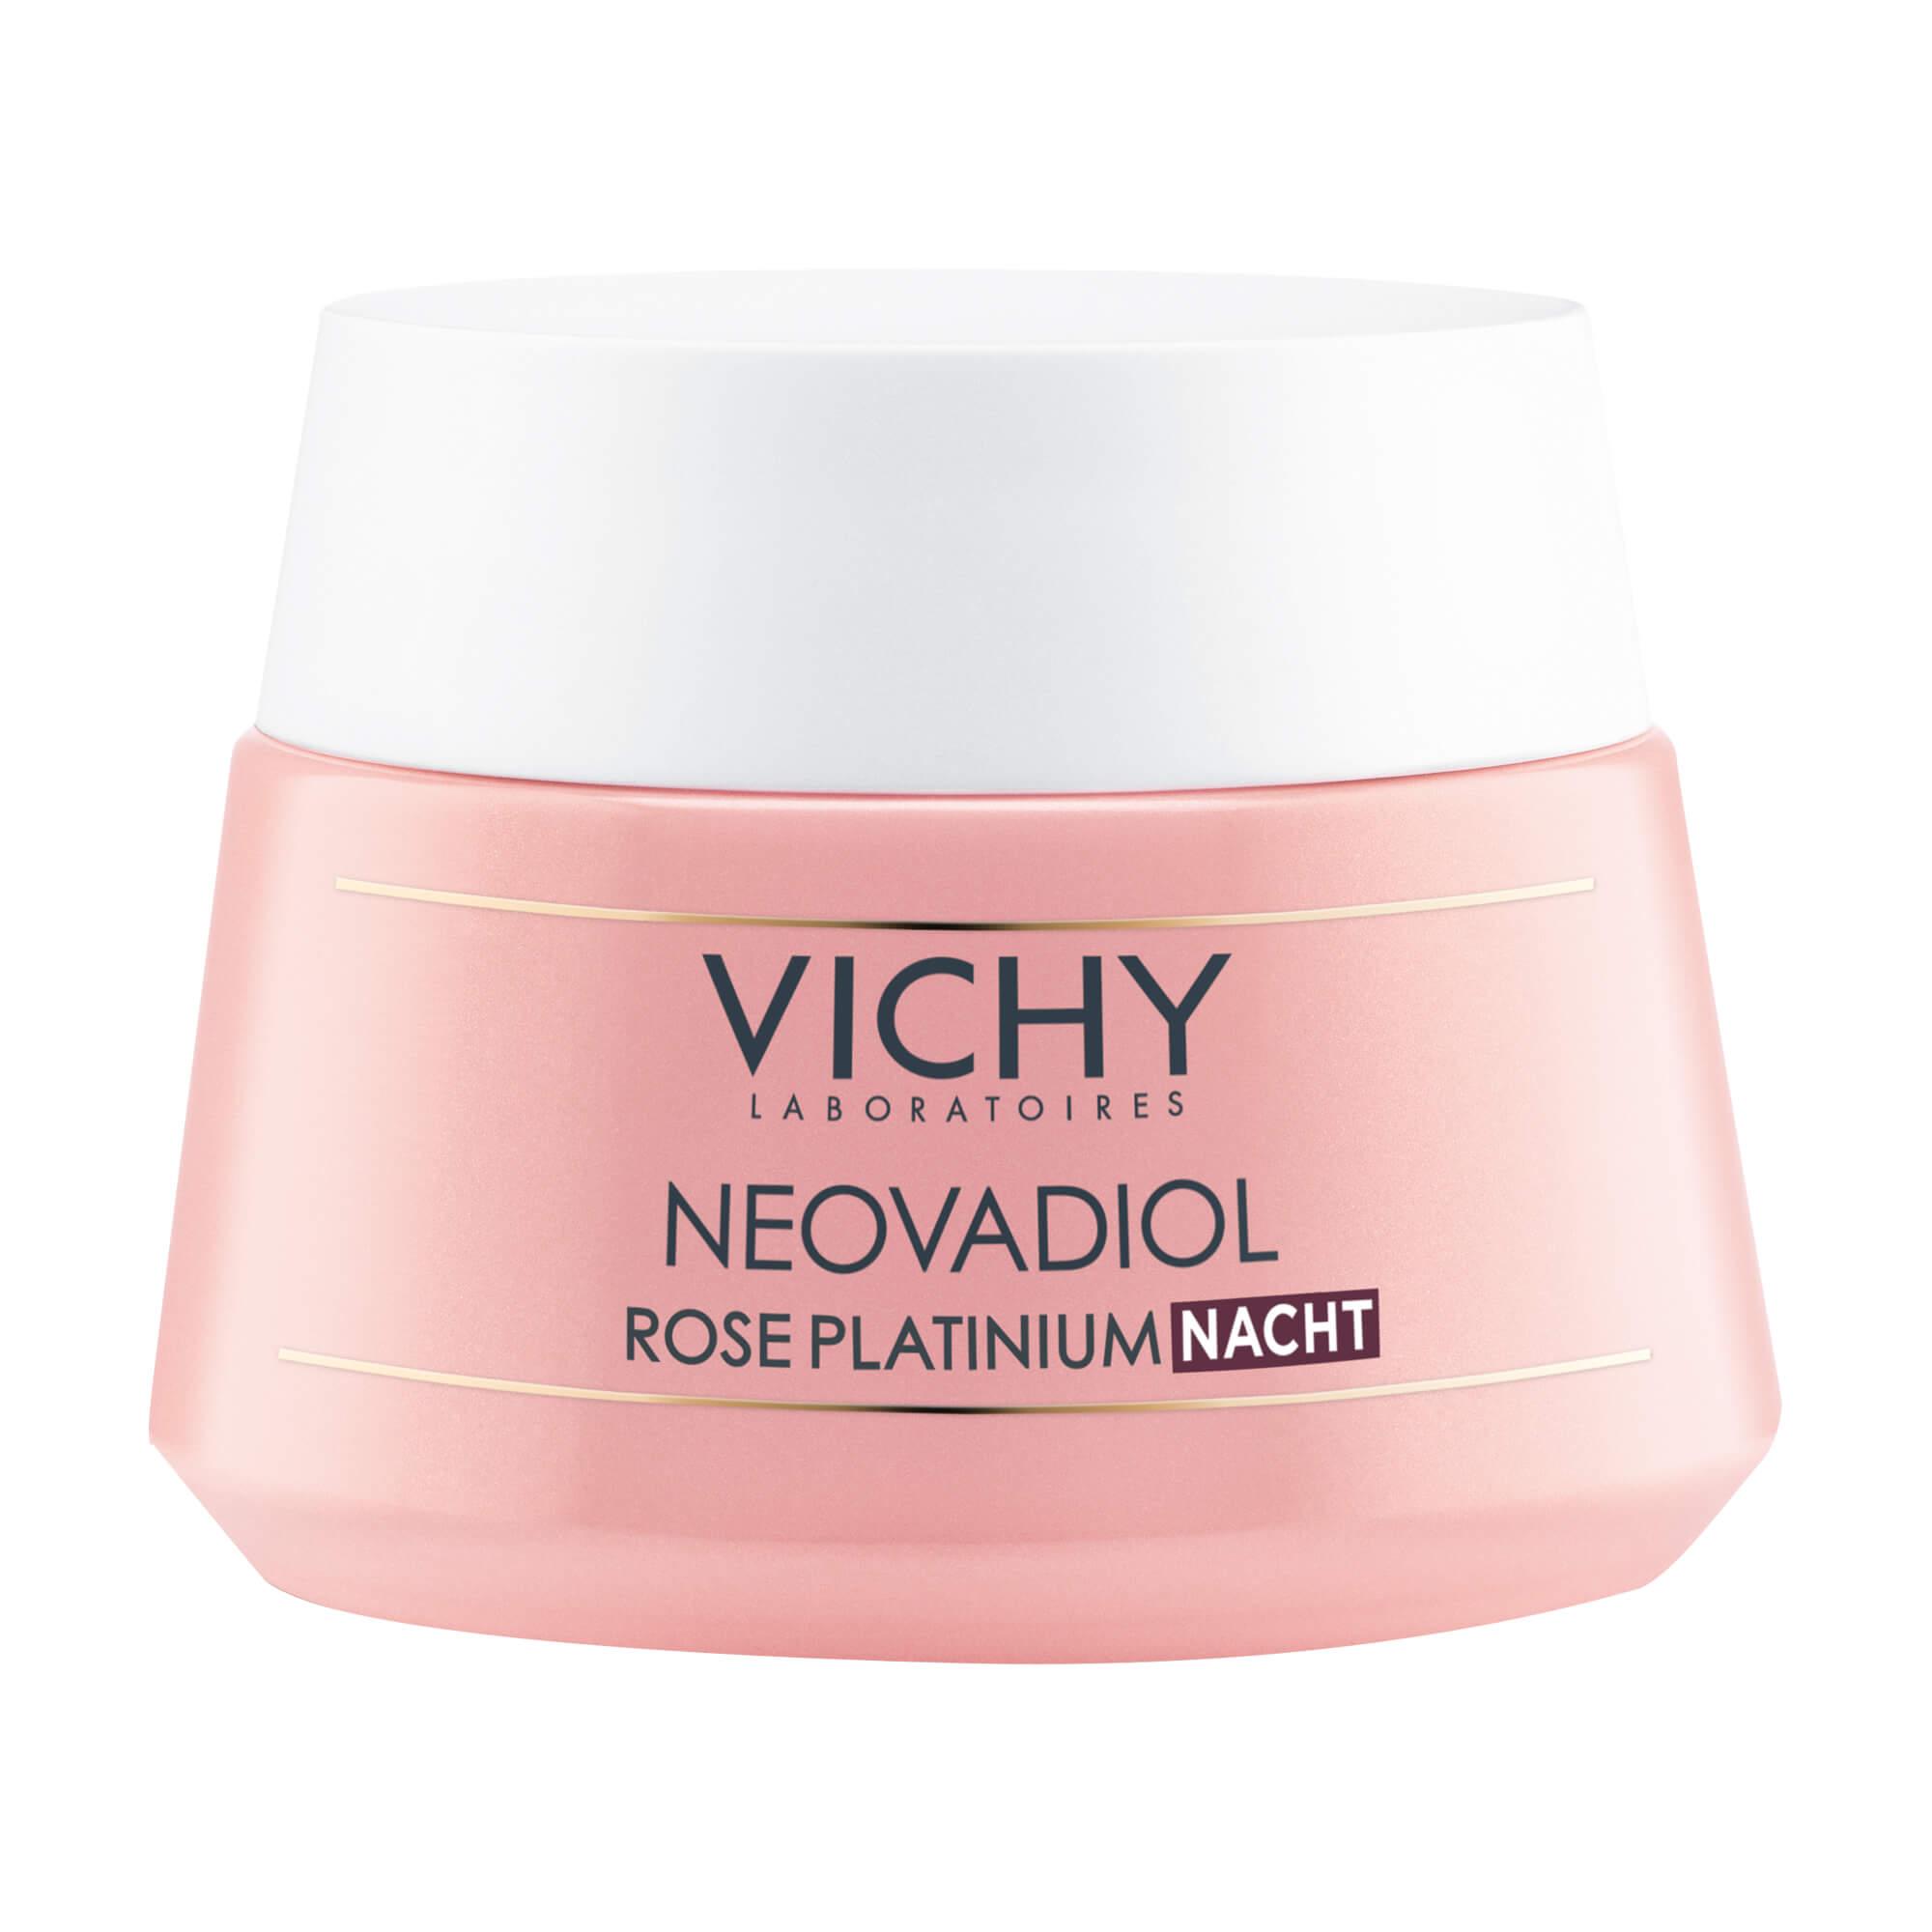 Vichy Neovadiol Rose Platinium Nachtcreme